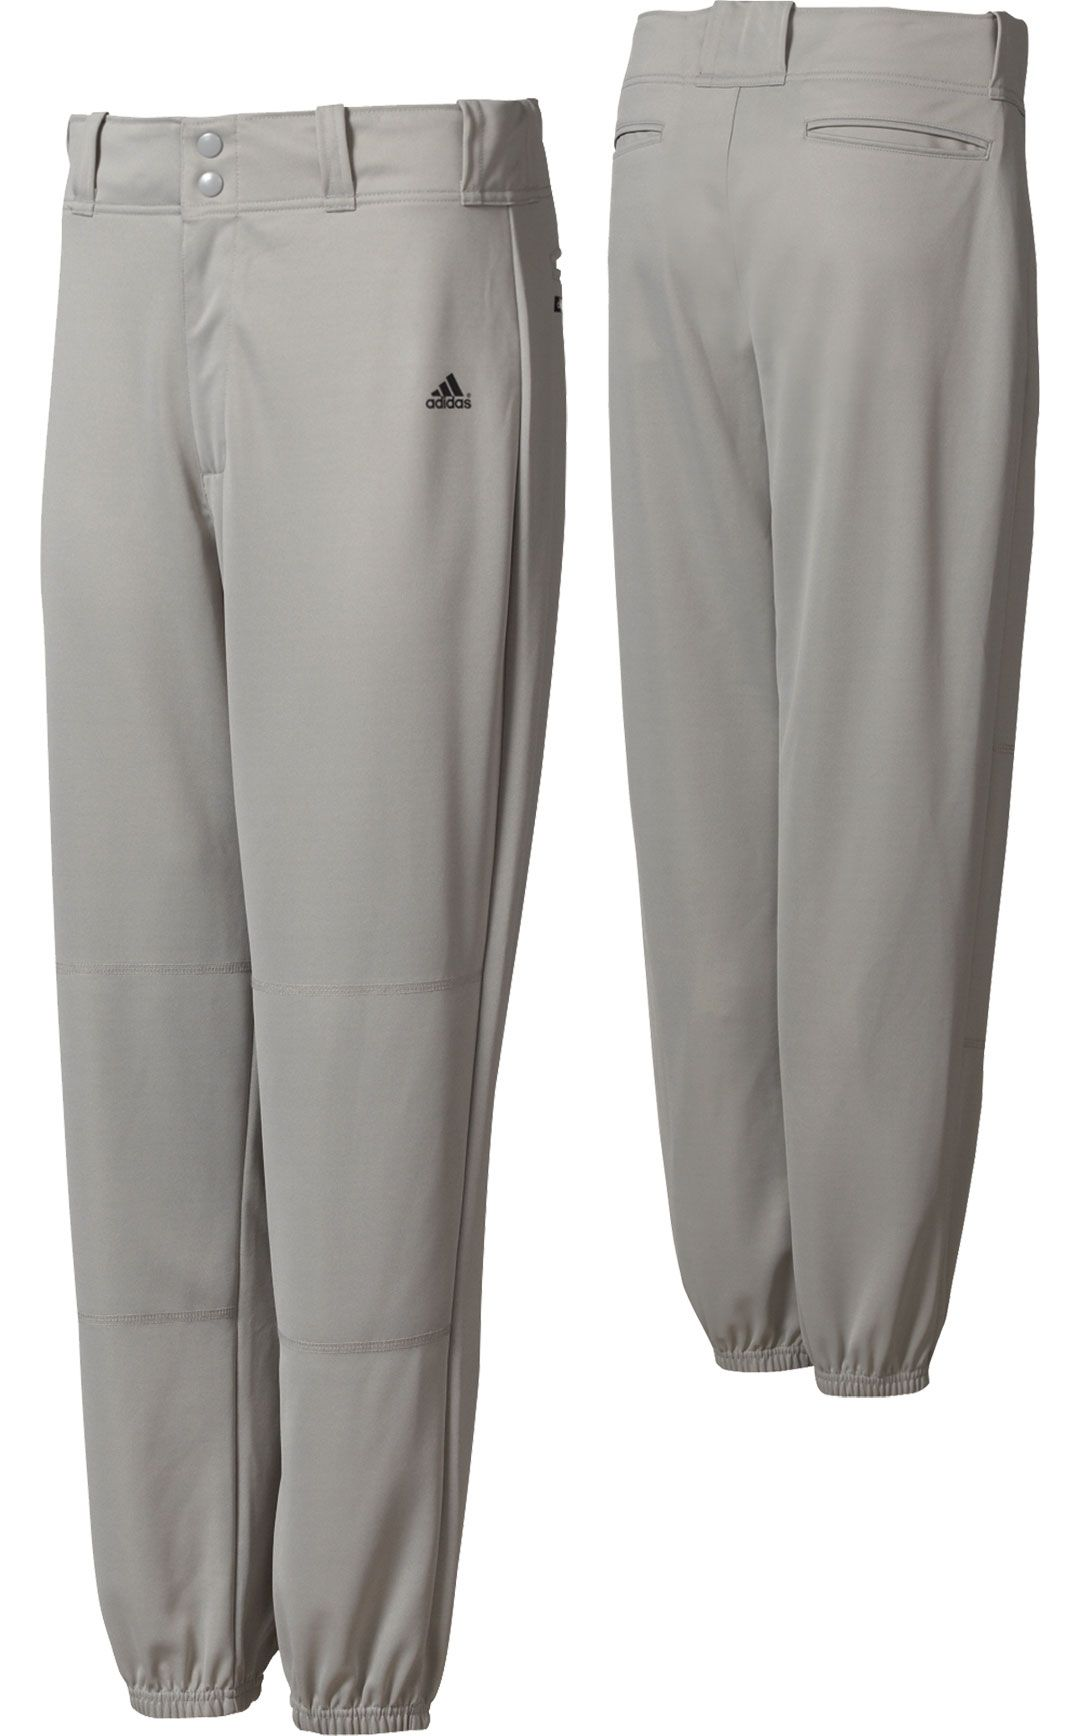 5b39ad66bd772 adidas Men's Incite Closed Bottom Baseball Pants | DICK'S Sporting Goods